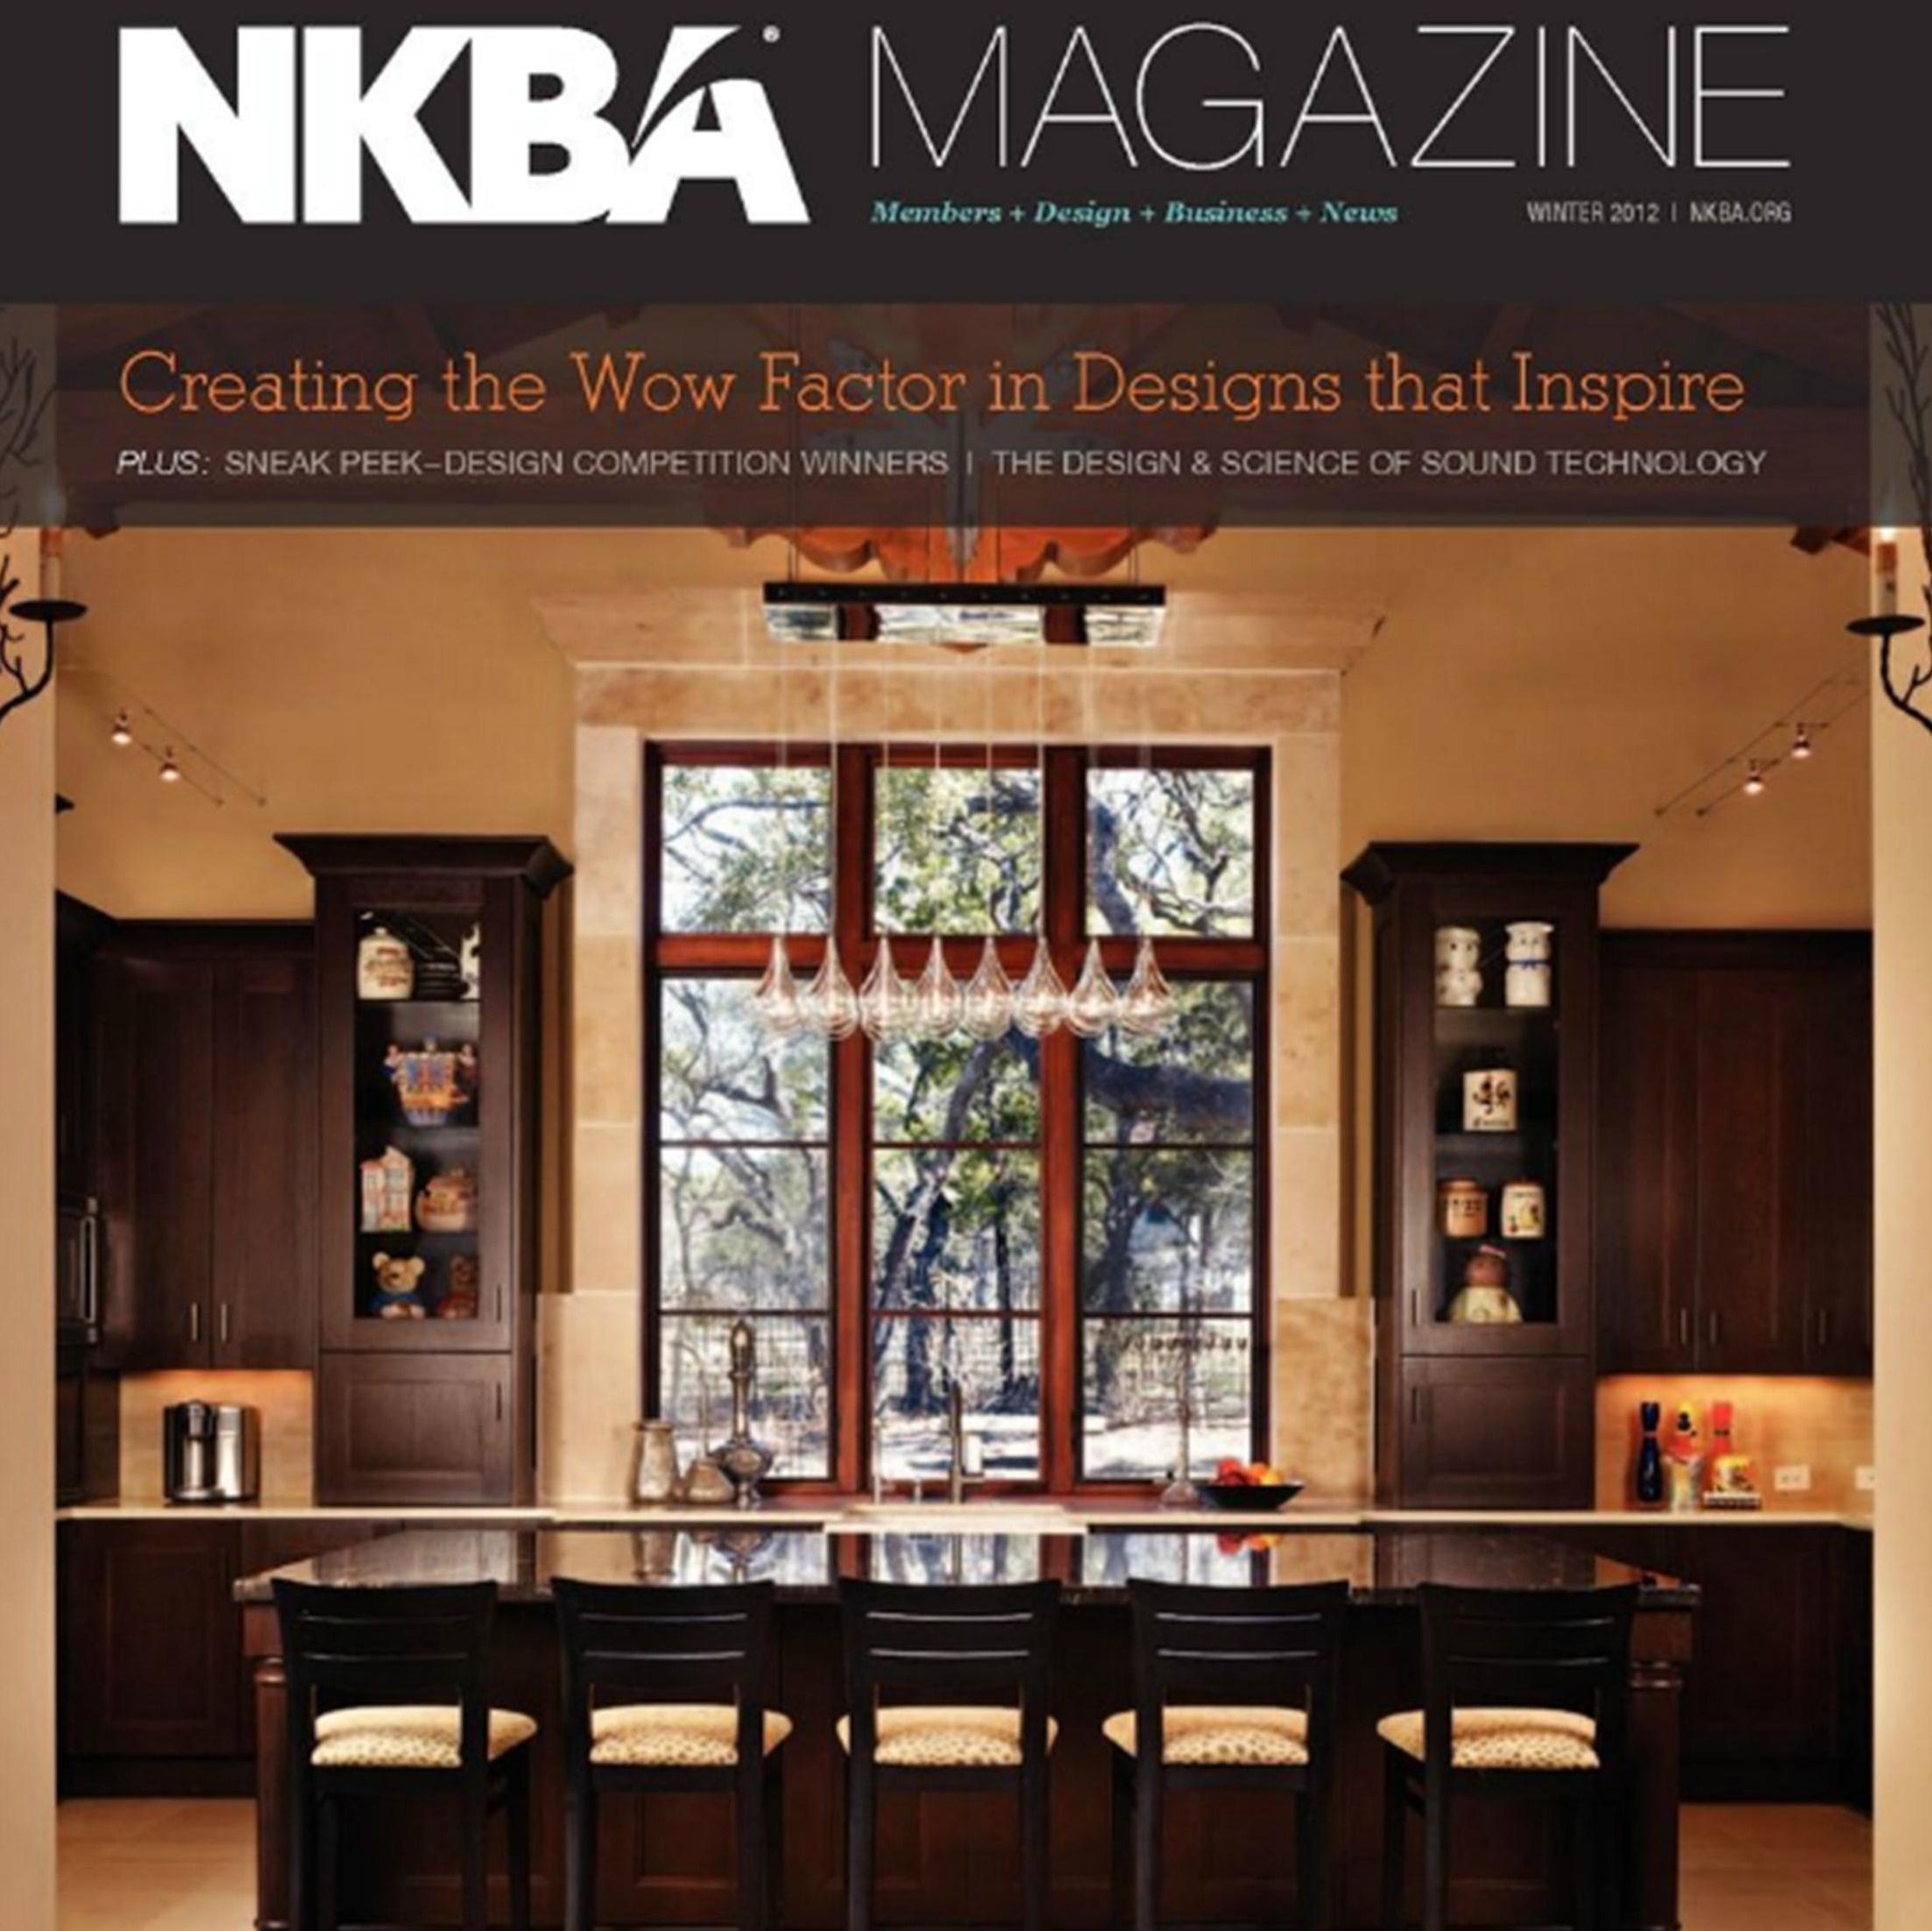 NKBA Magazine 3-2012.jpg